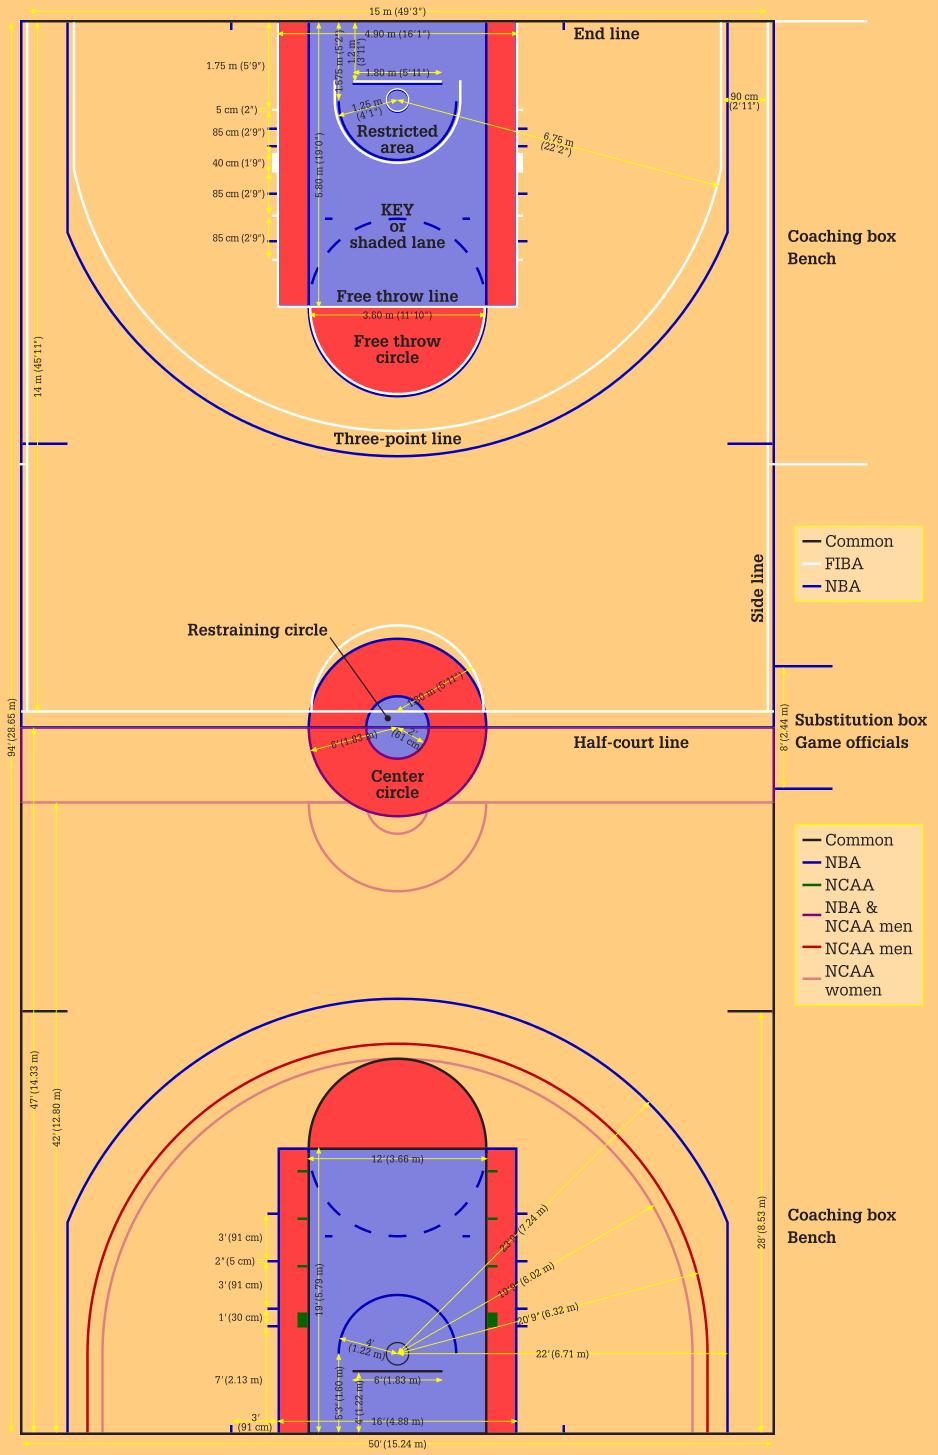 Organisasi Basket Internasional : organisasi, basket, internasional, Pecinta, Basket,, Inilah, Kriteria, Ukuran, Lapangan, Basket, Standar, Internasional, Kompasiana.com